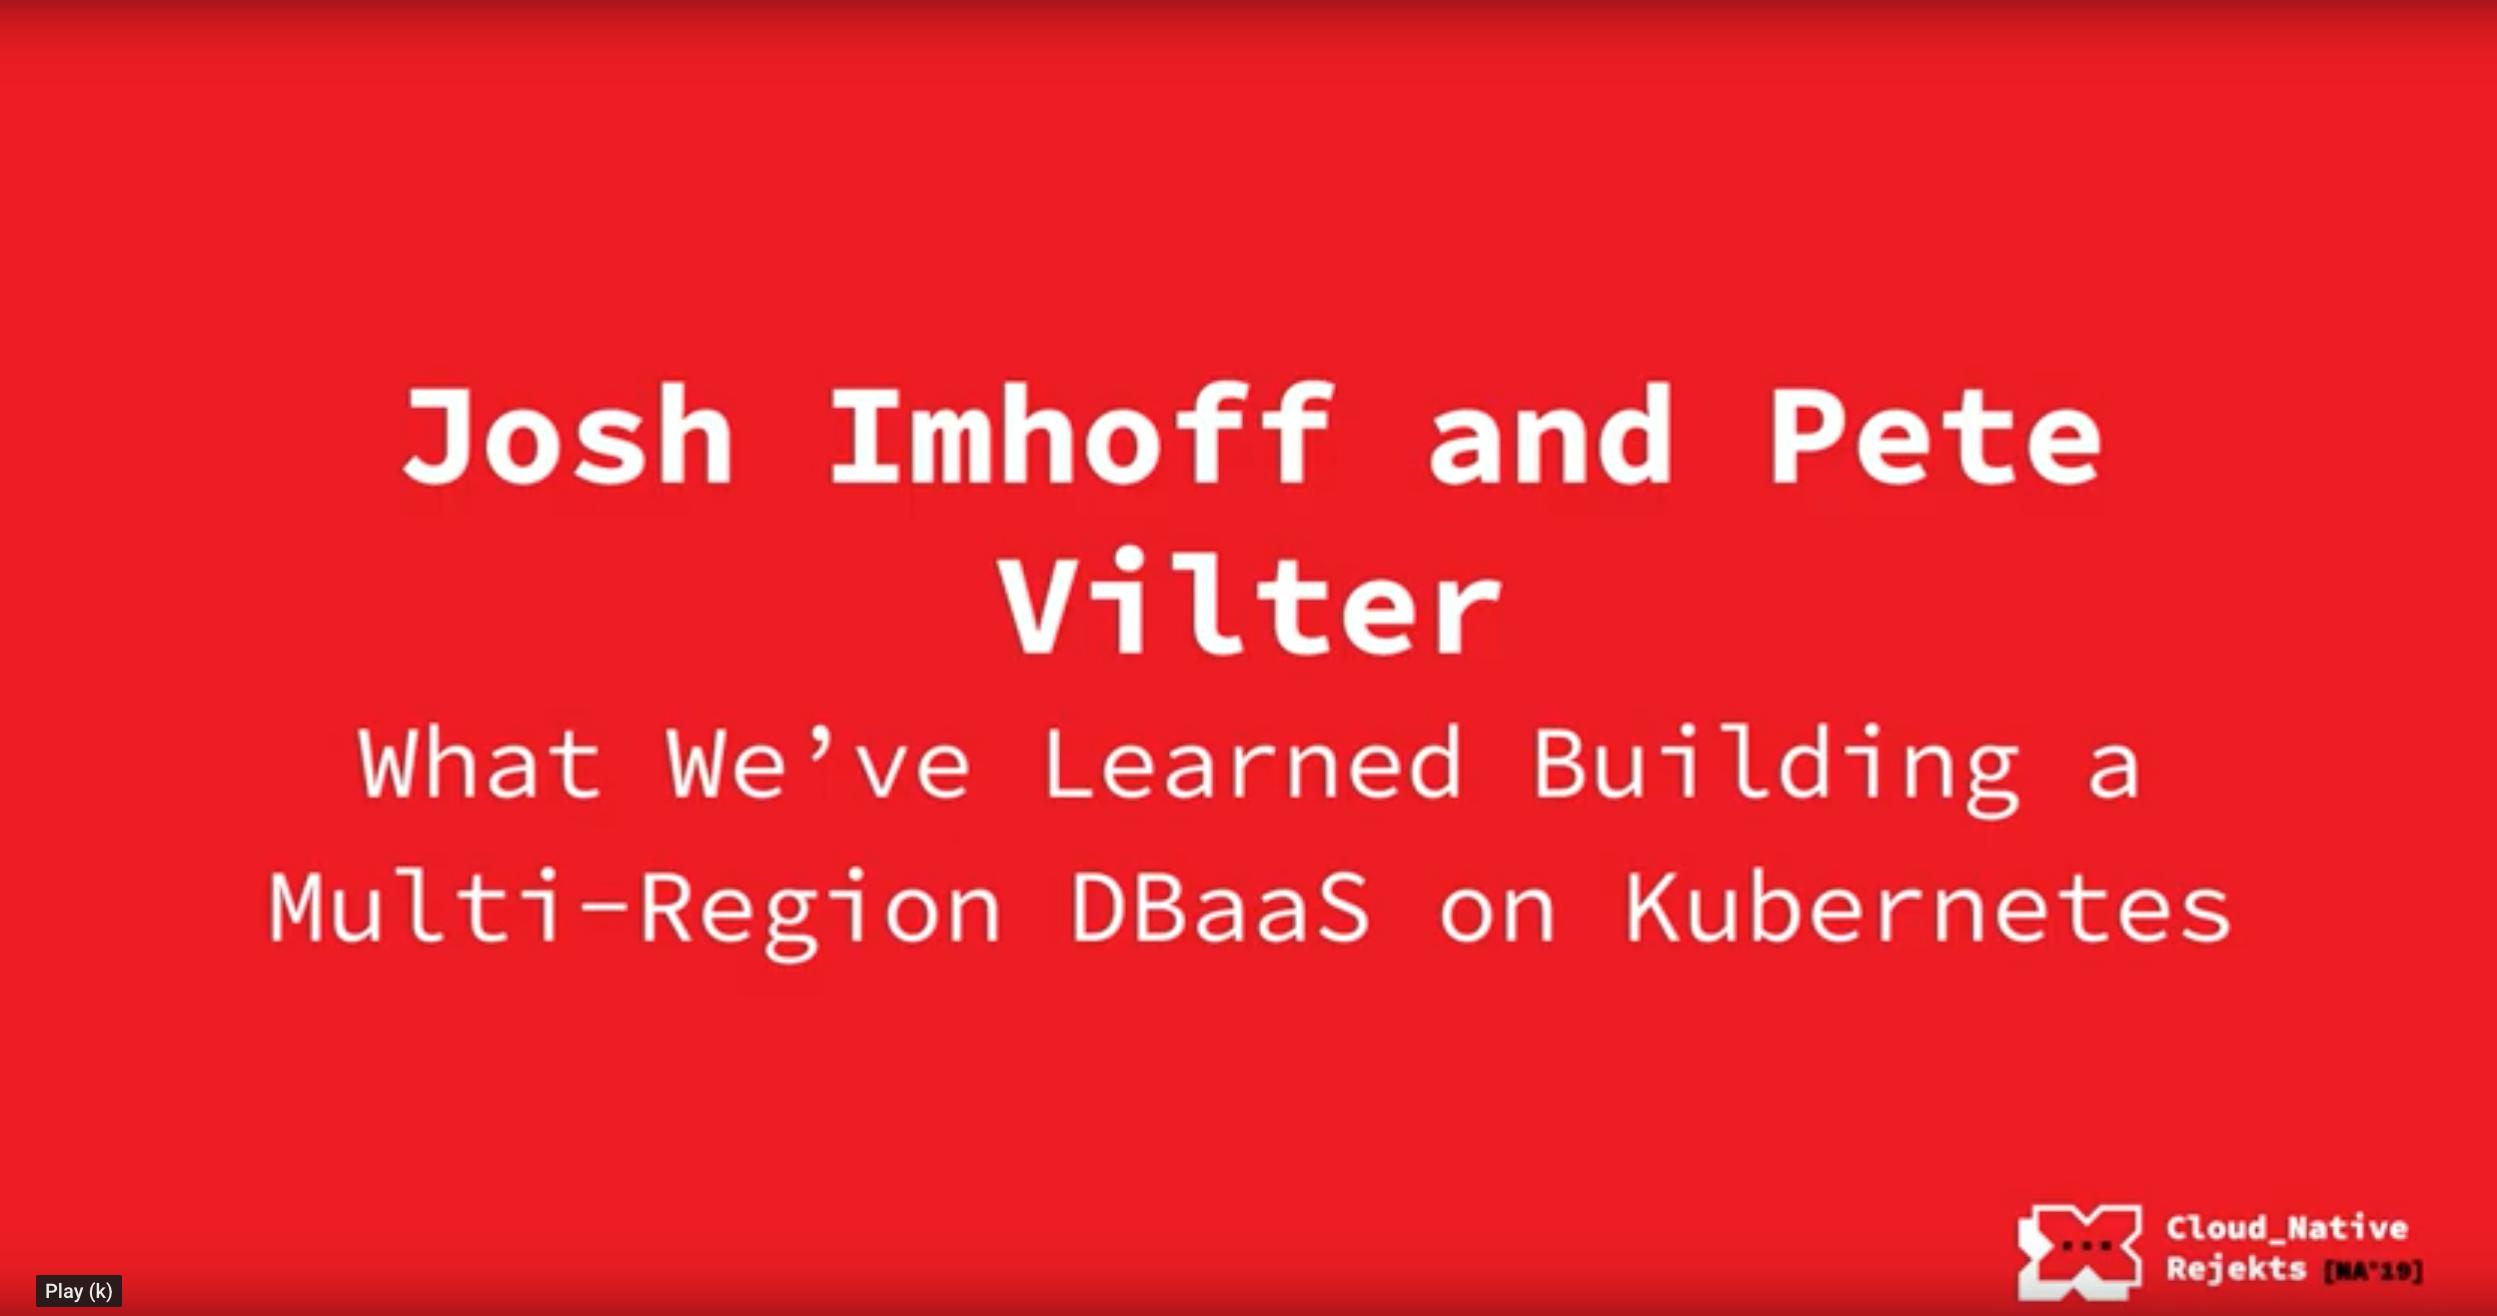 What We've Learned Building a Multi-Region DBaaS on Kubernetes [Cloud Native Rejekts 2019]